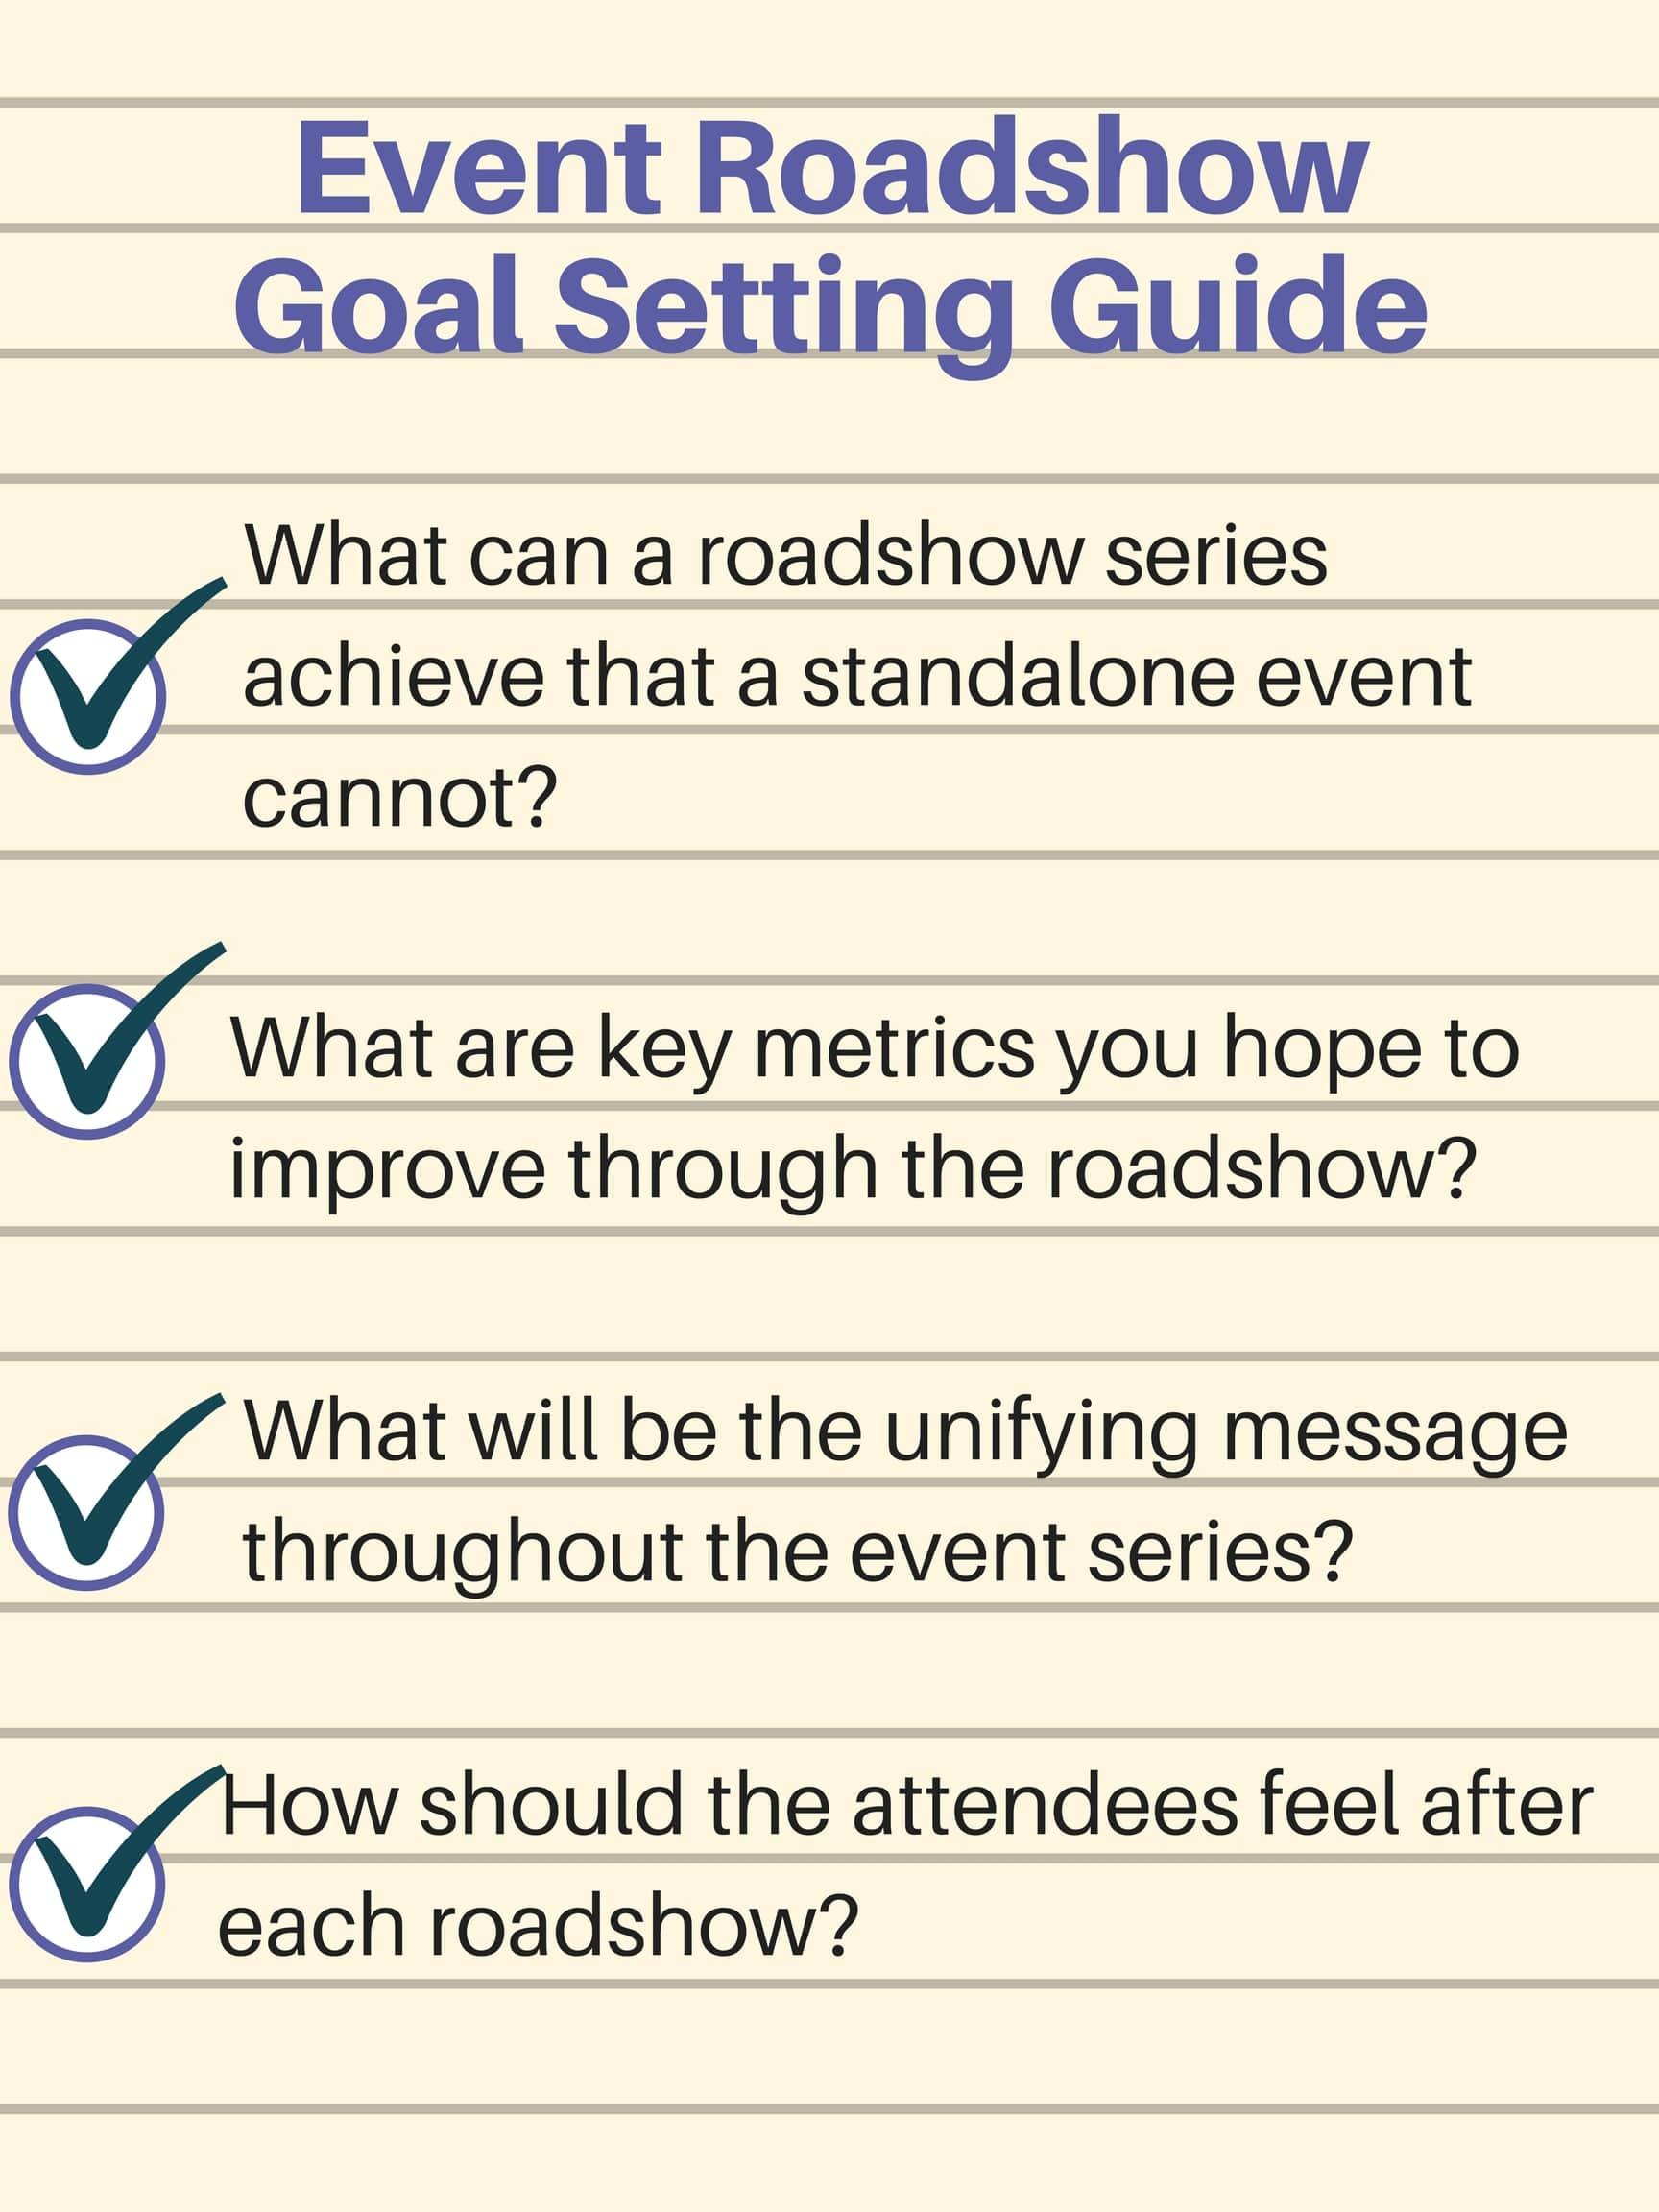 Event Roadshow goal setting guide - Event Roadshow Guide